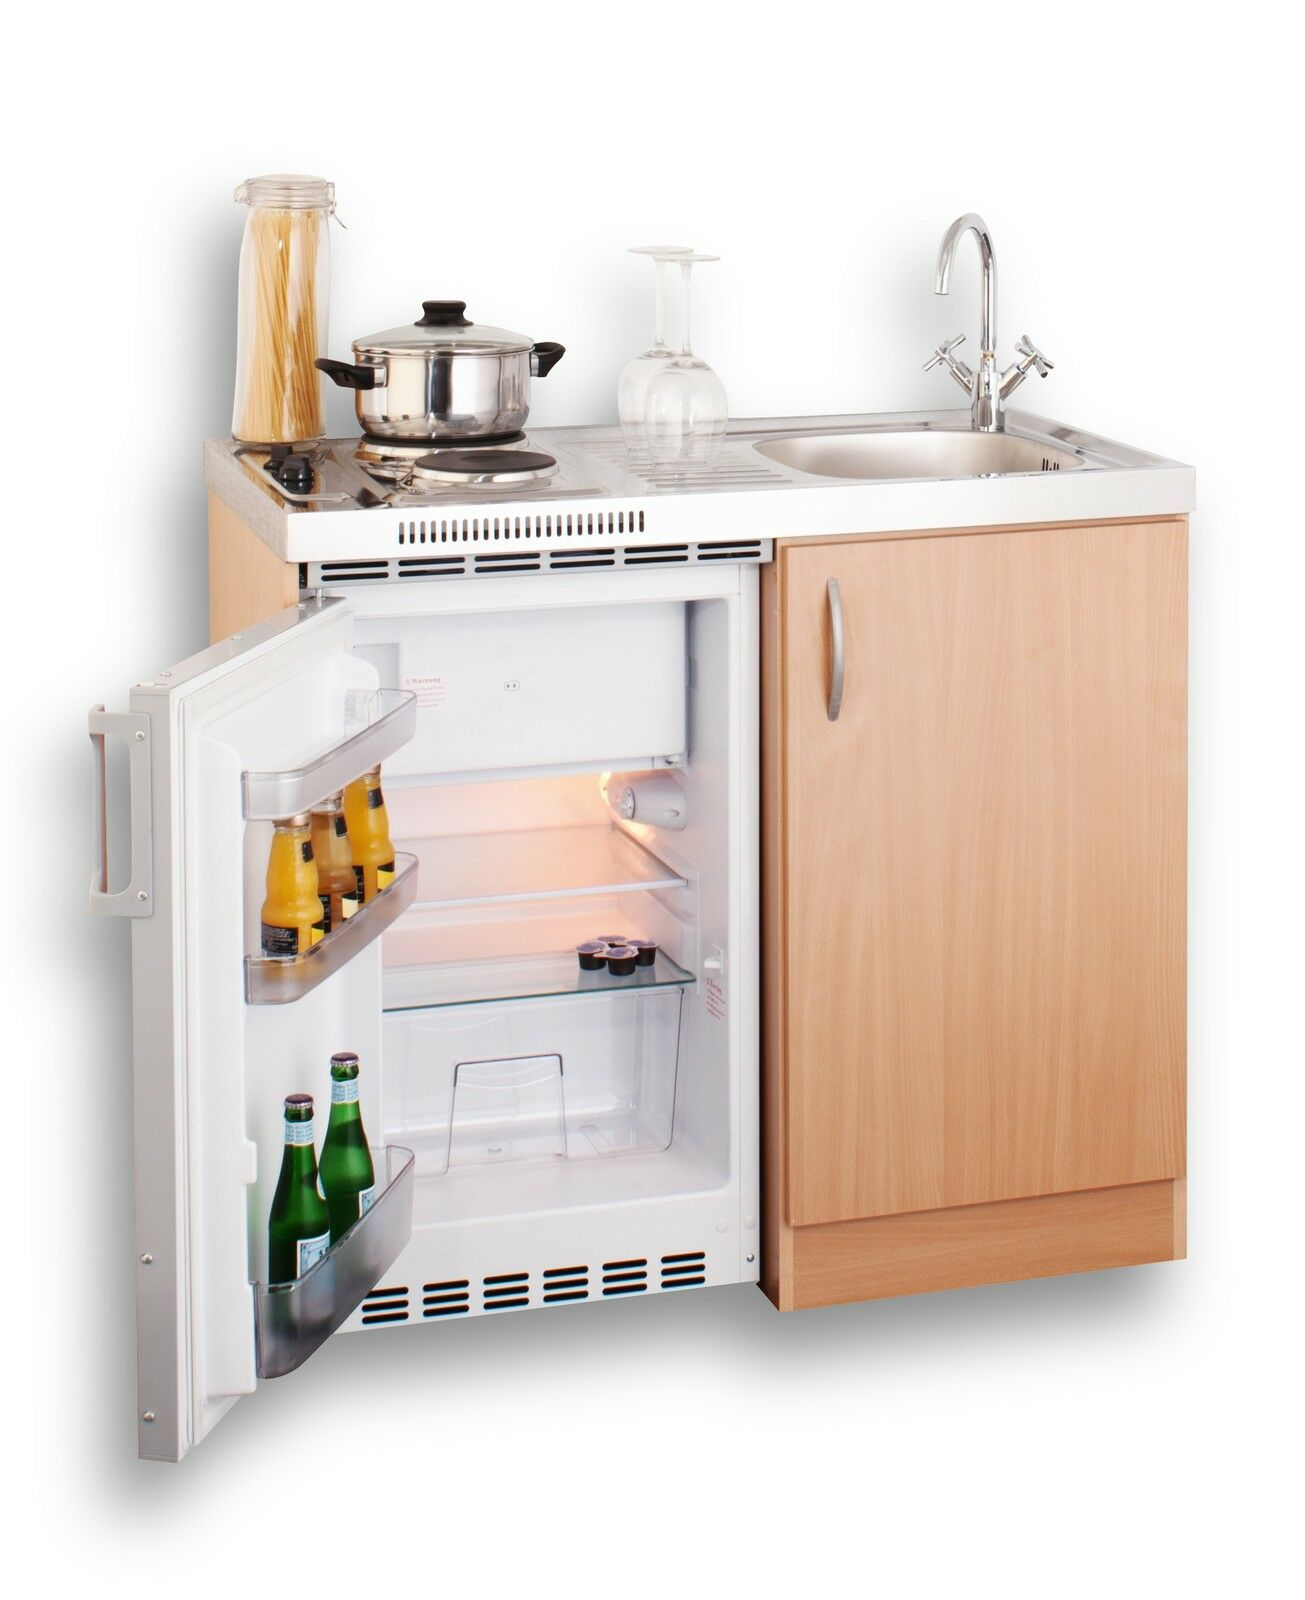 Singleküchen  Kühlschrank Archive - Singleküchen GÜNSTIG